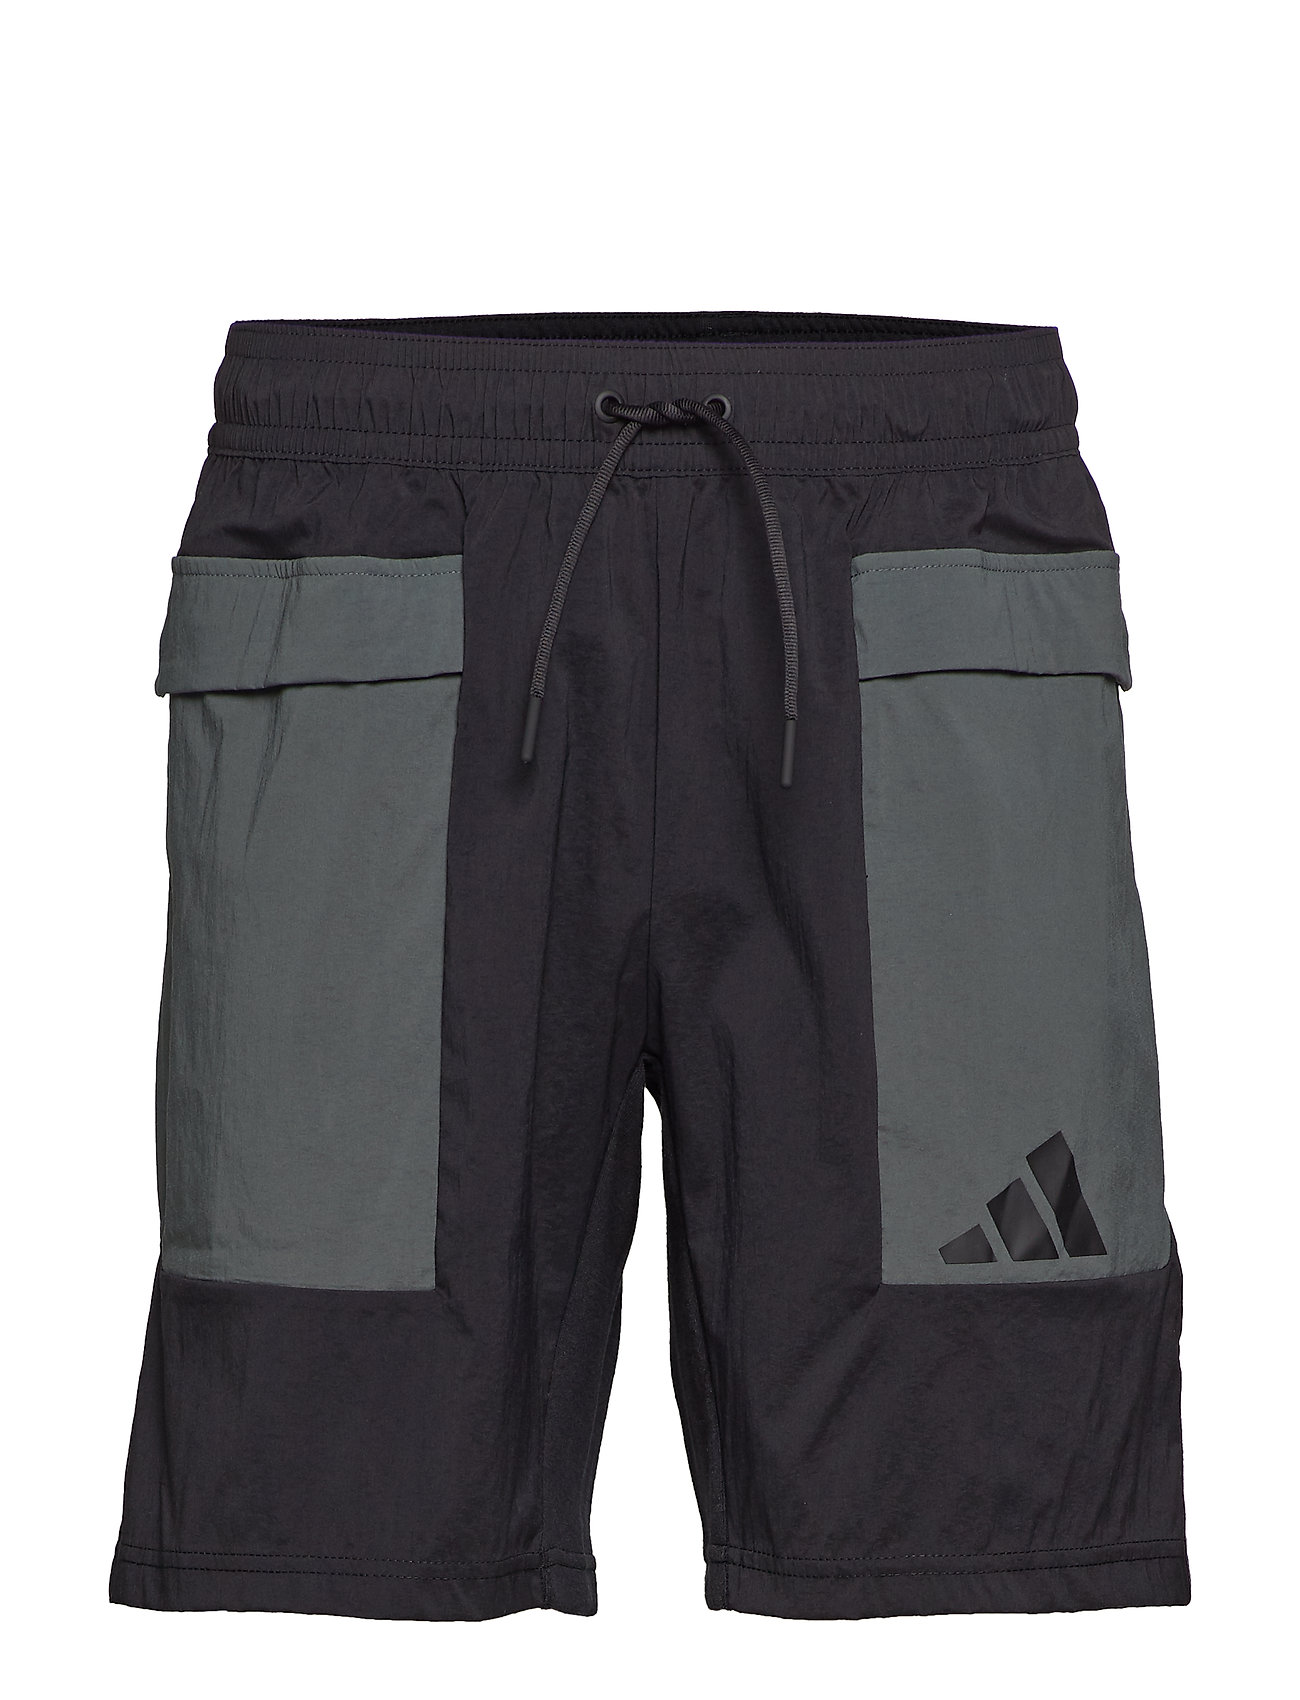 adidas Performance The Pack Short - BLACK/LEGIVY